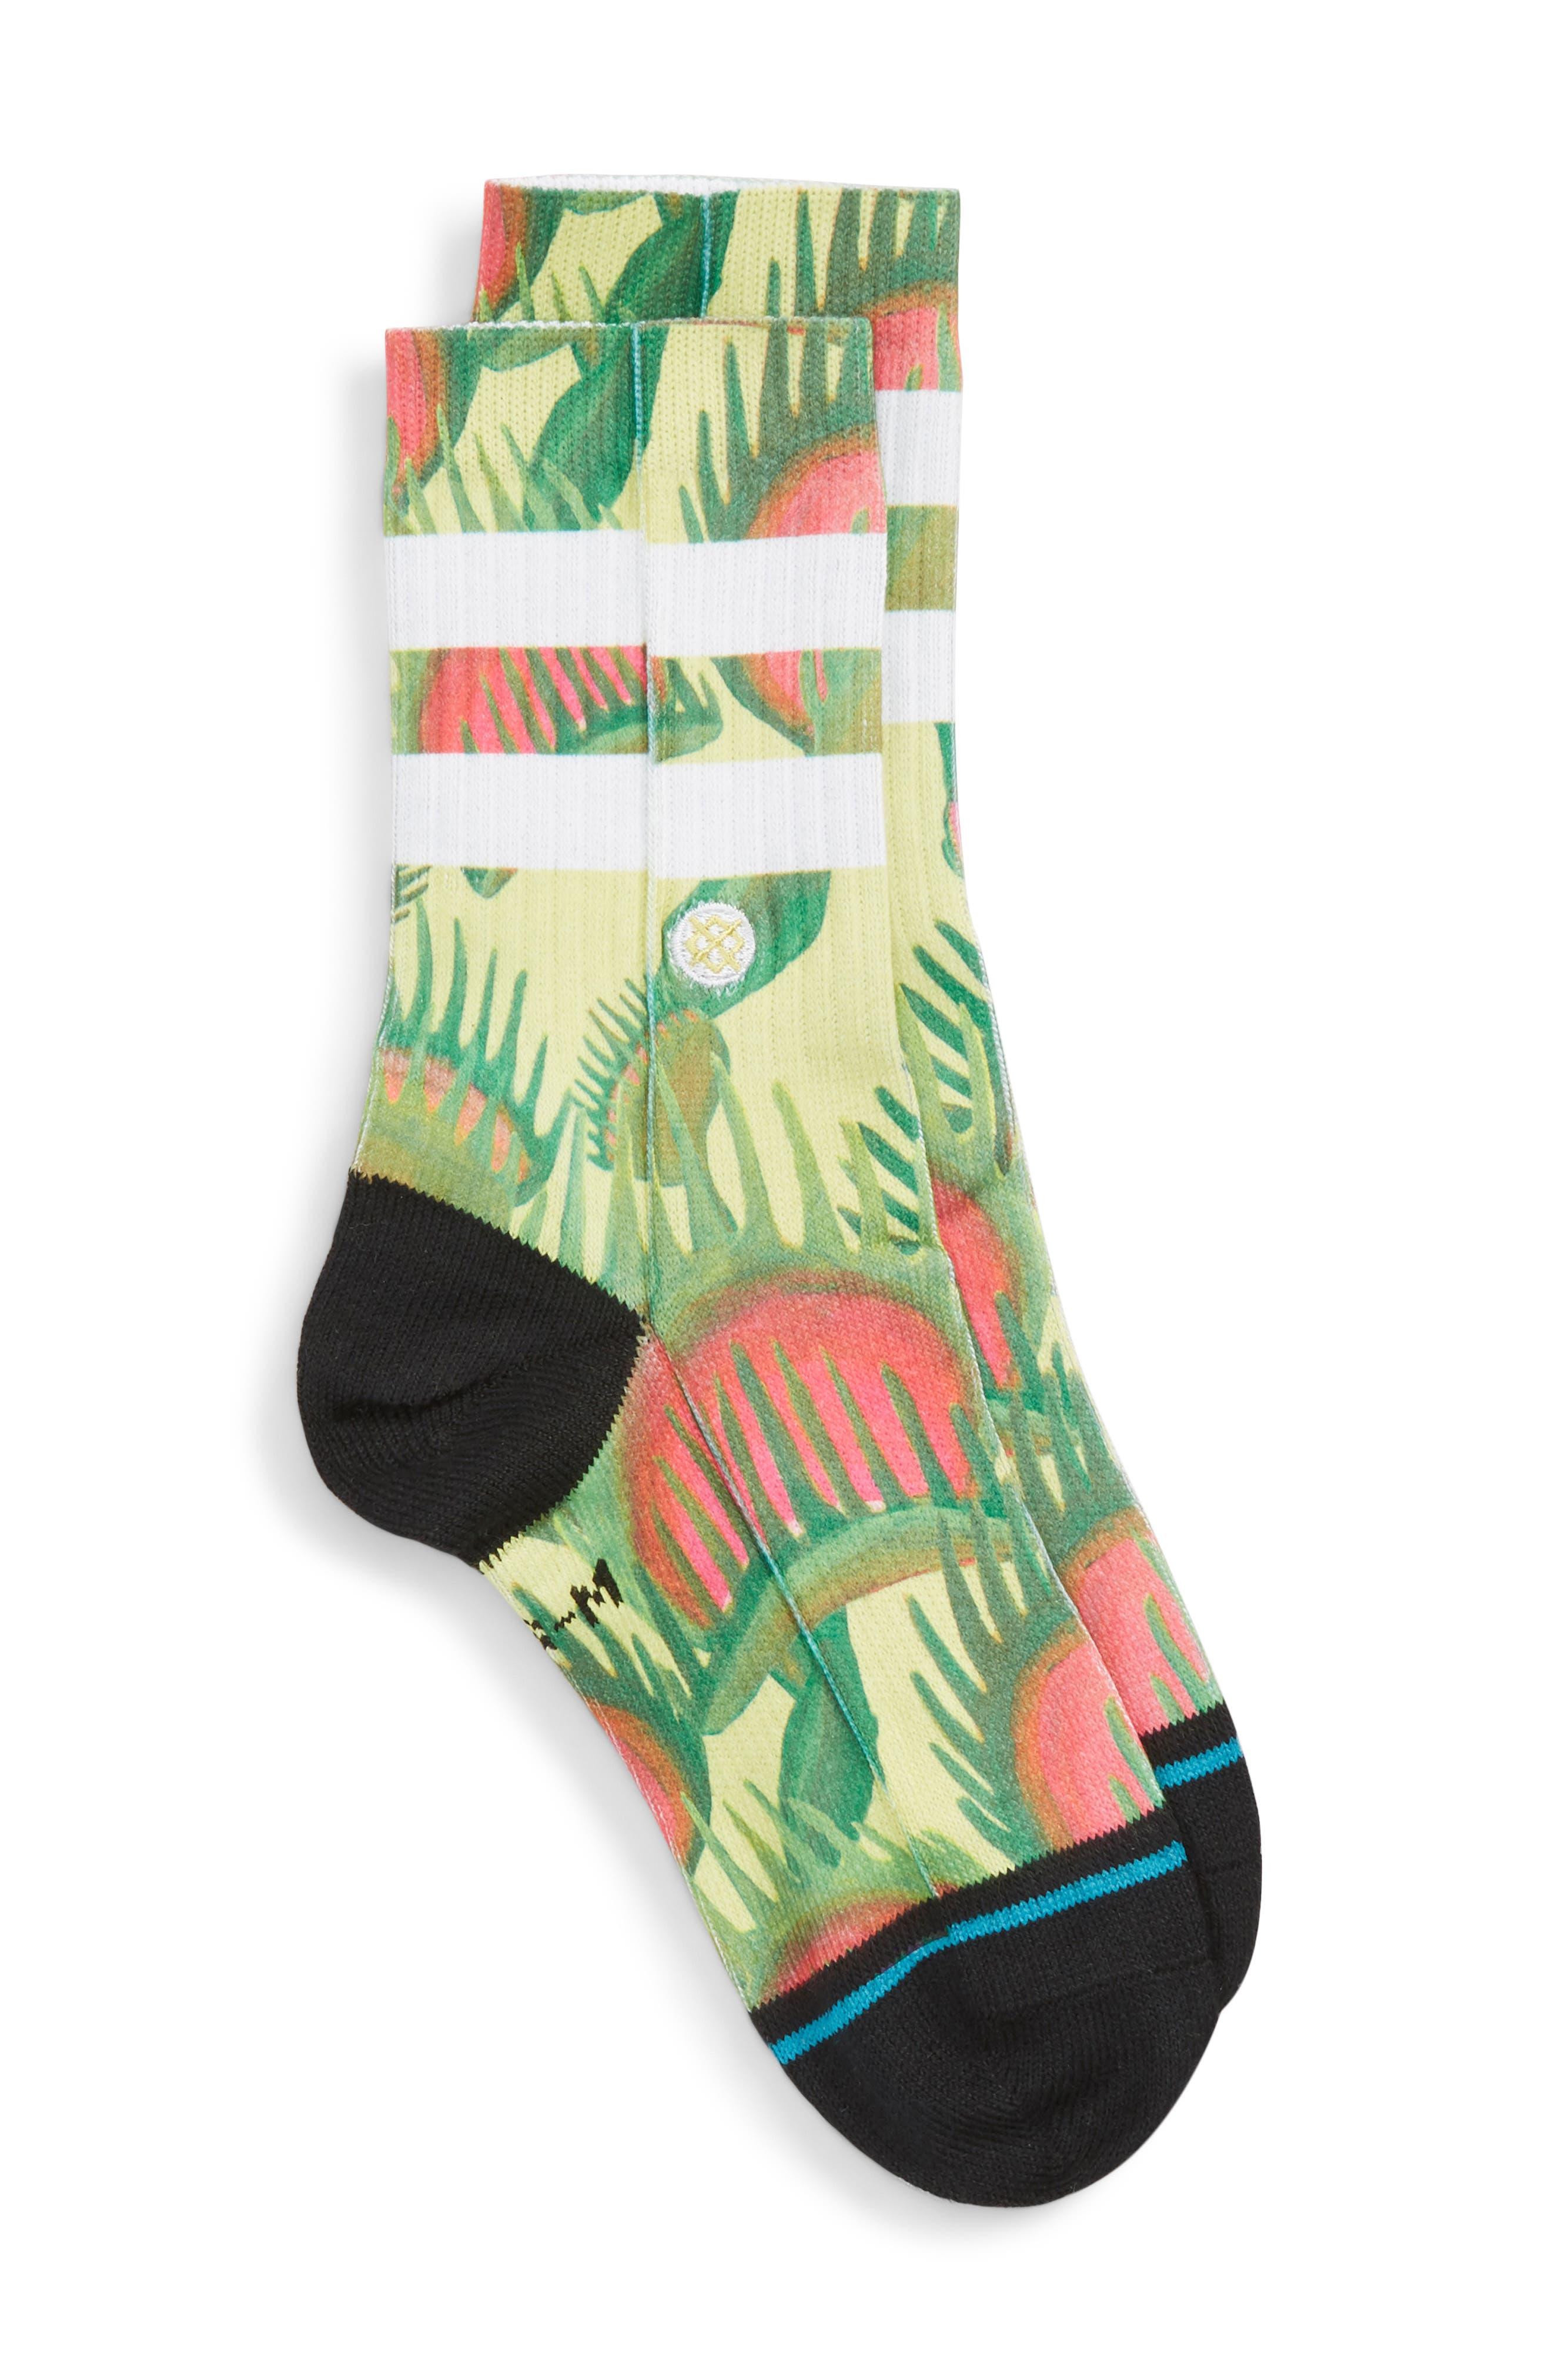 Trap King Socks,                             Main thumbnail 1, color,                             001